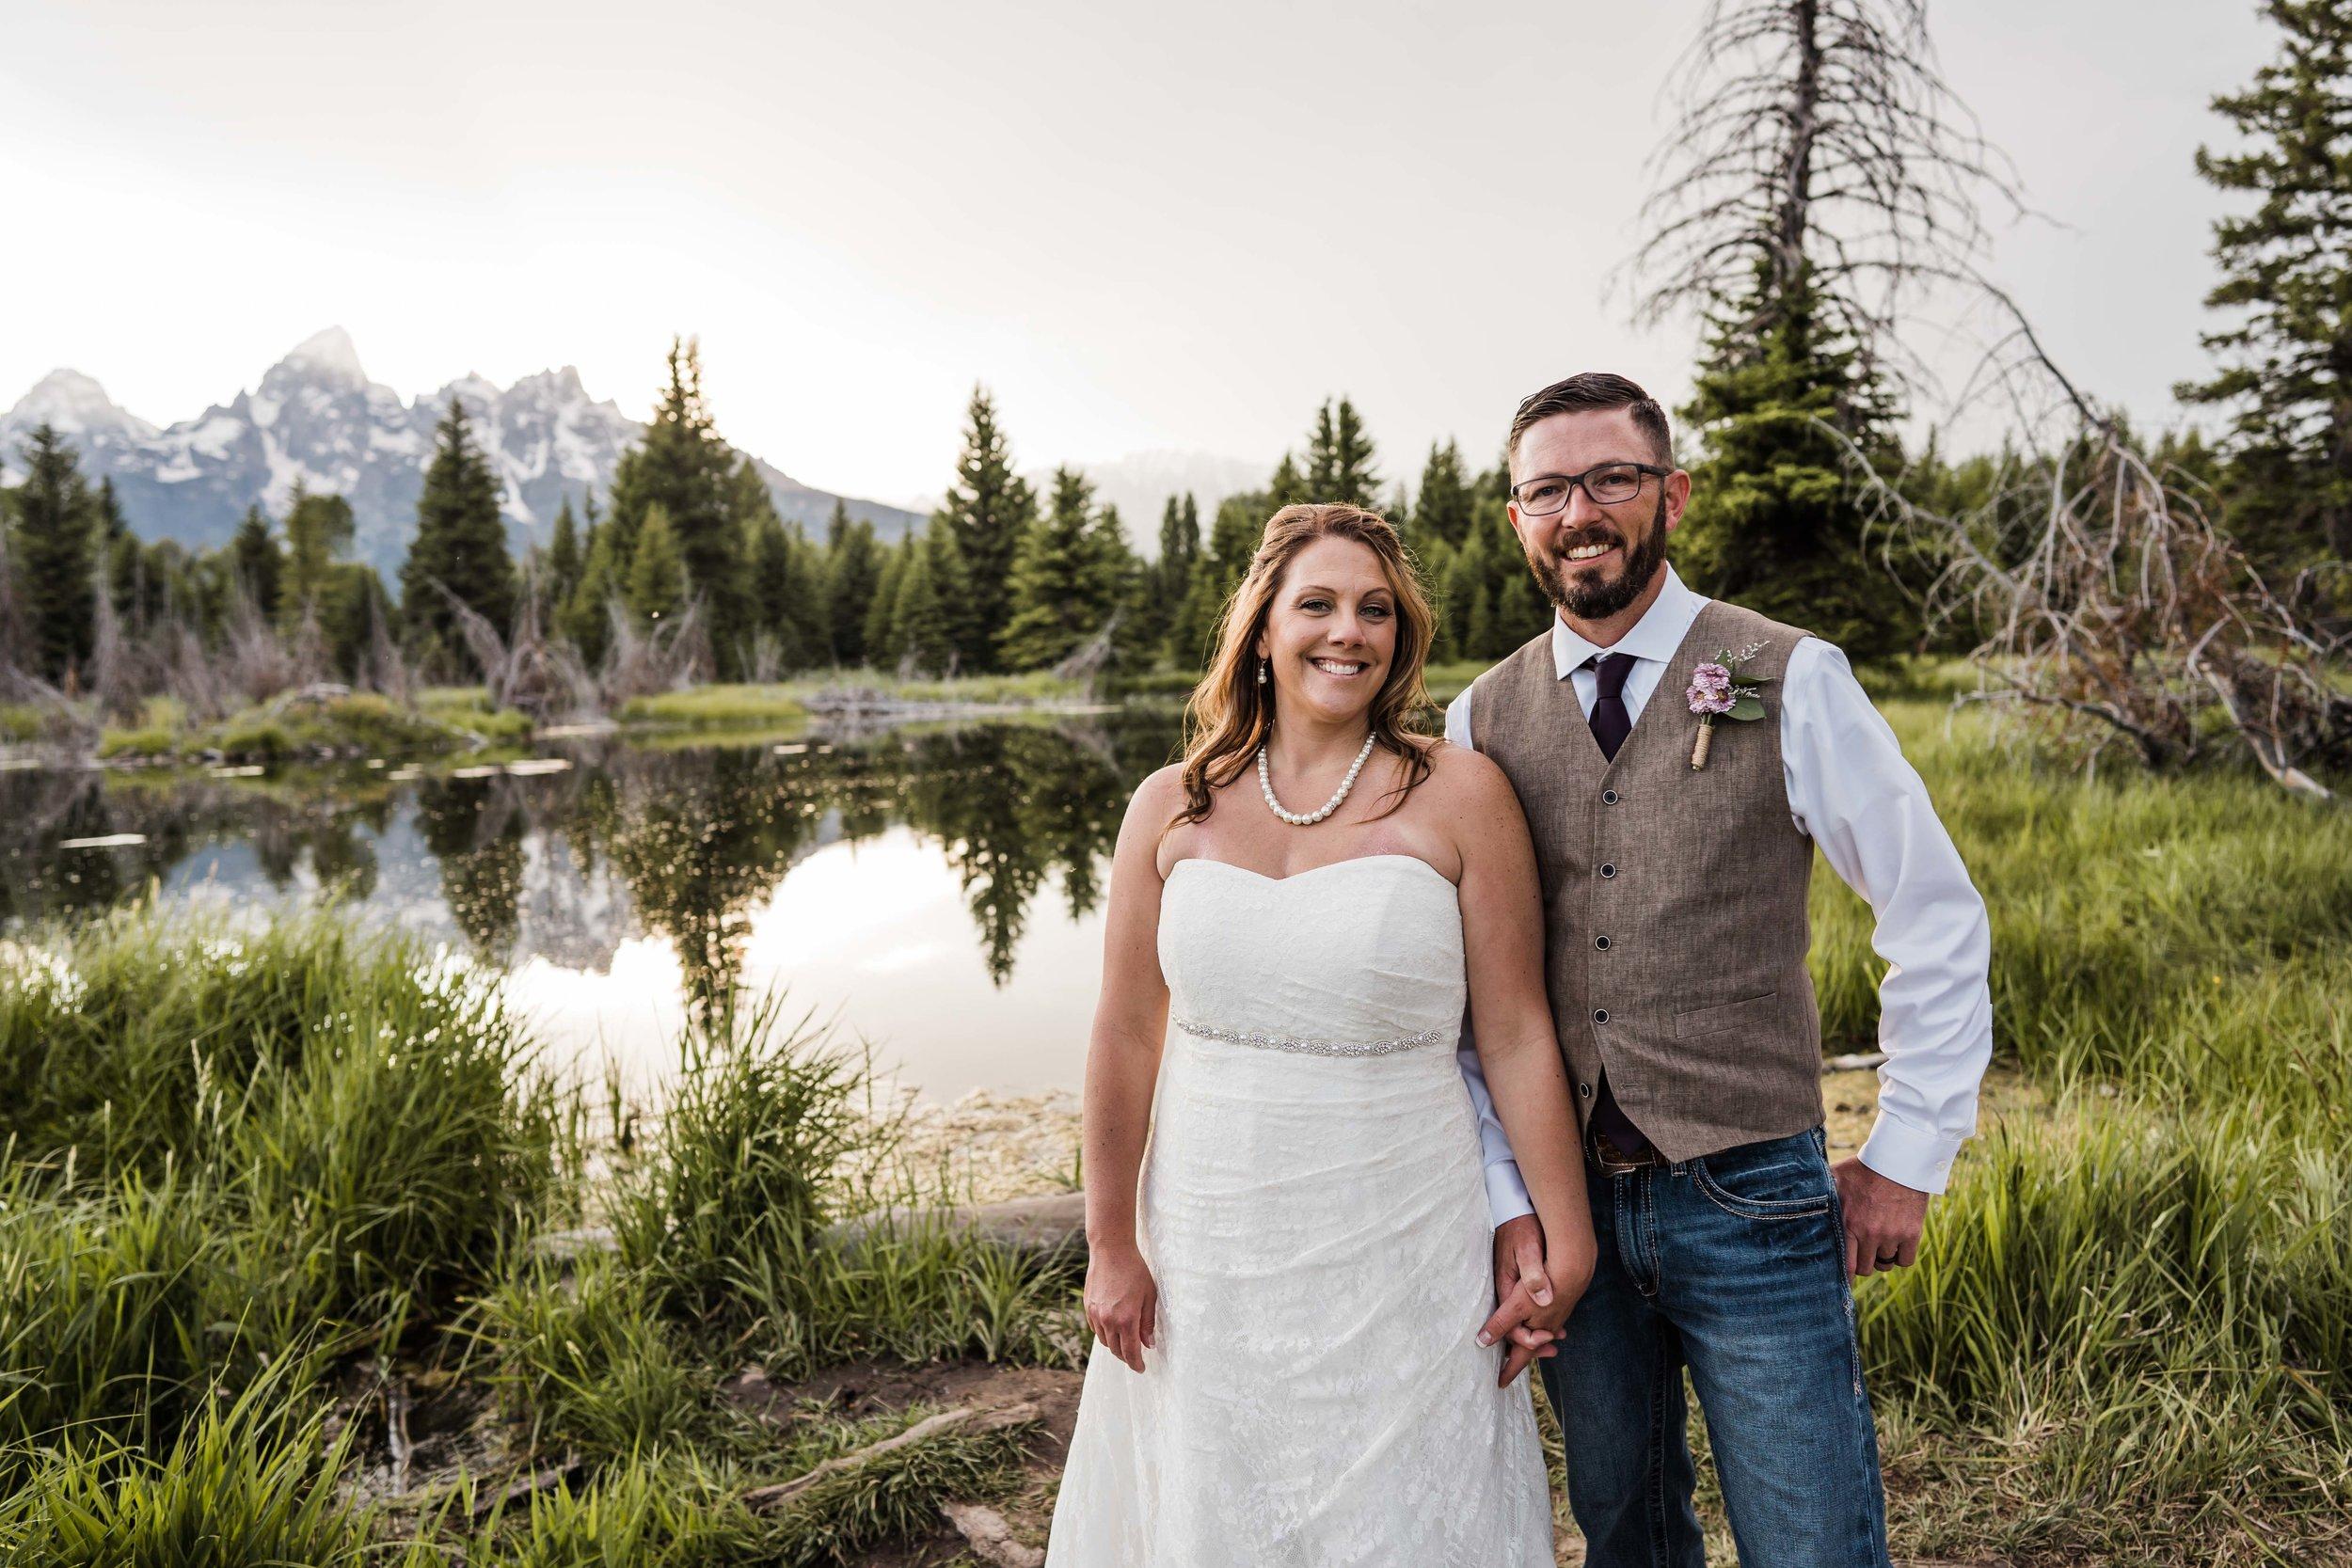 jackson hole adventure wedding photography at schwabachers landing in GTNP -DSD01975.jpg